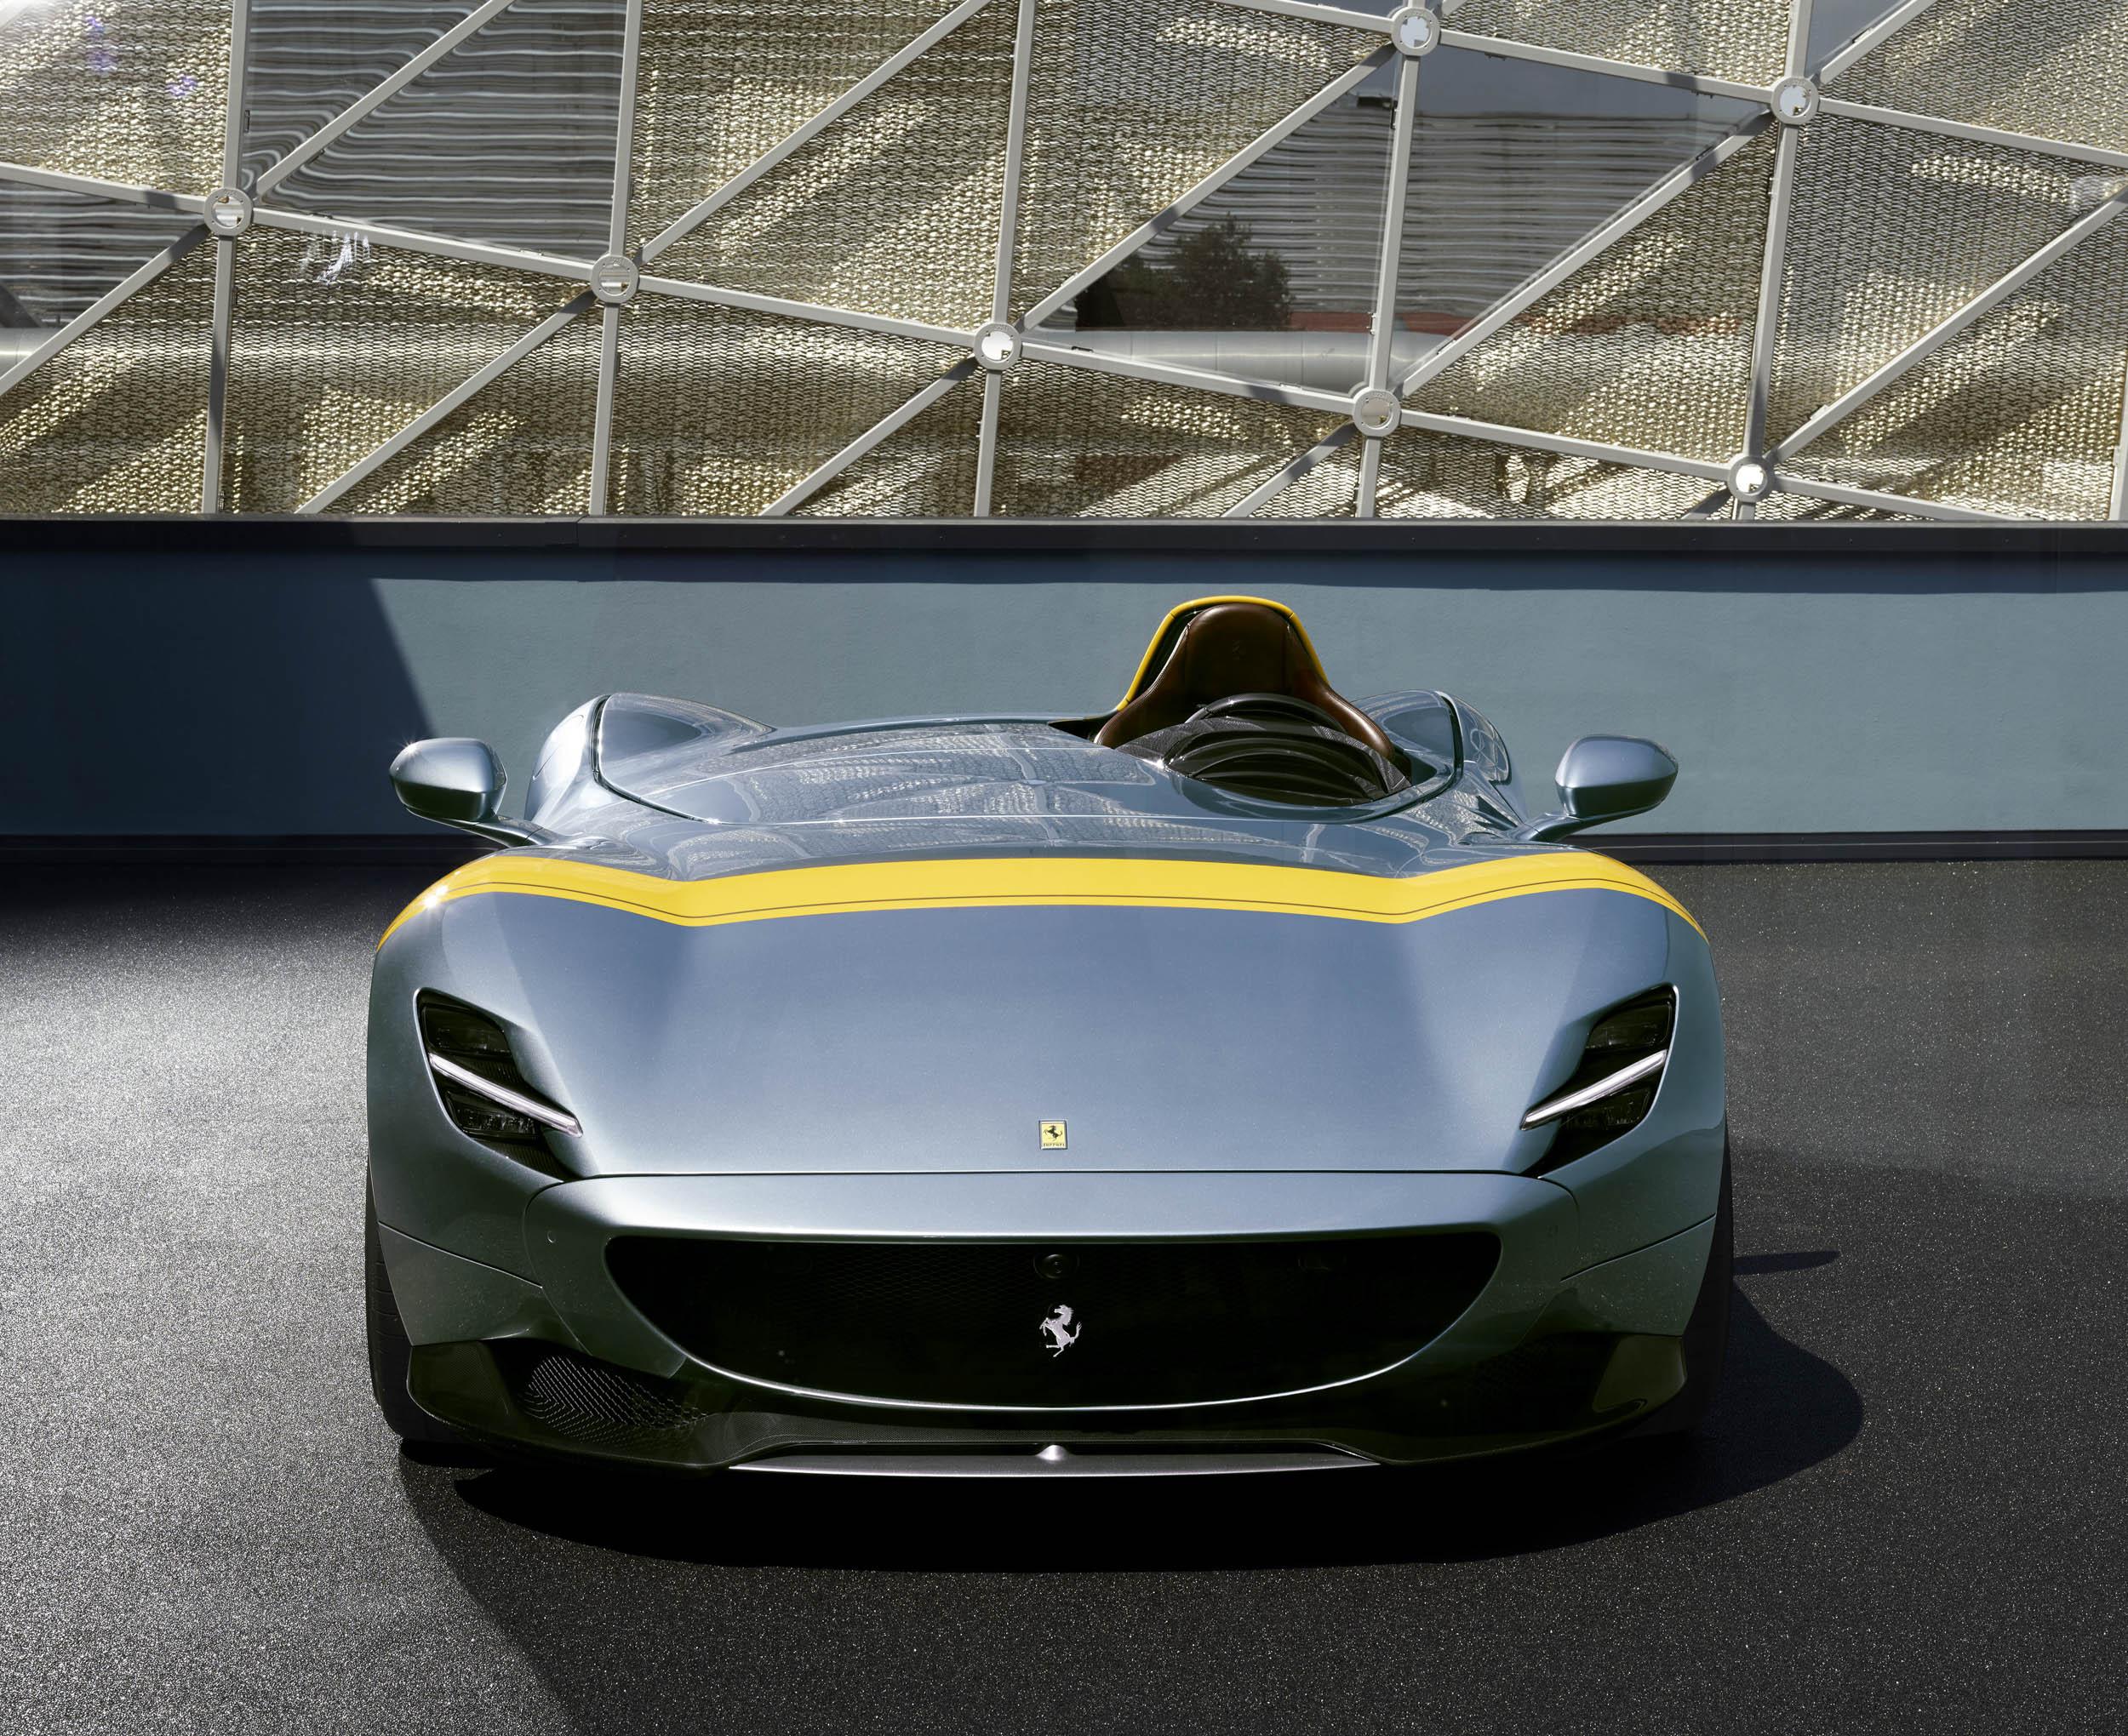 Ferrari Monza SP1 front